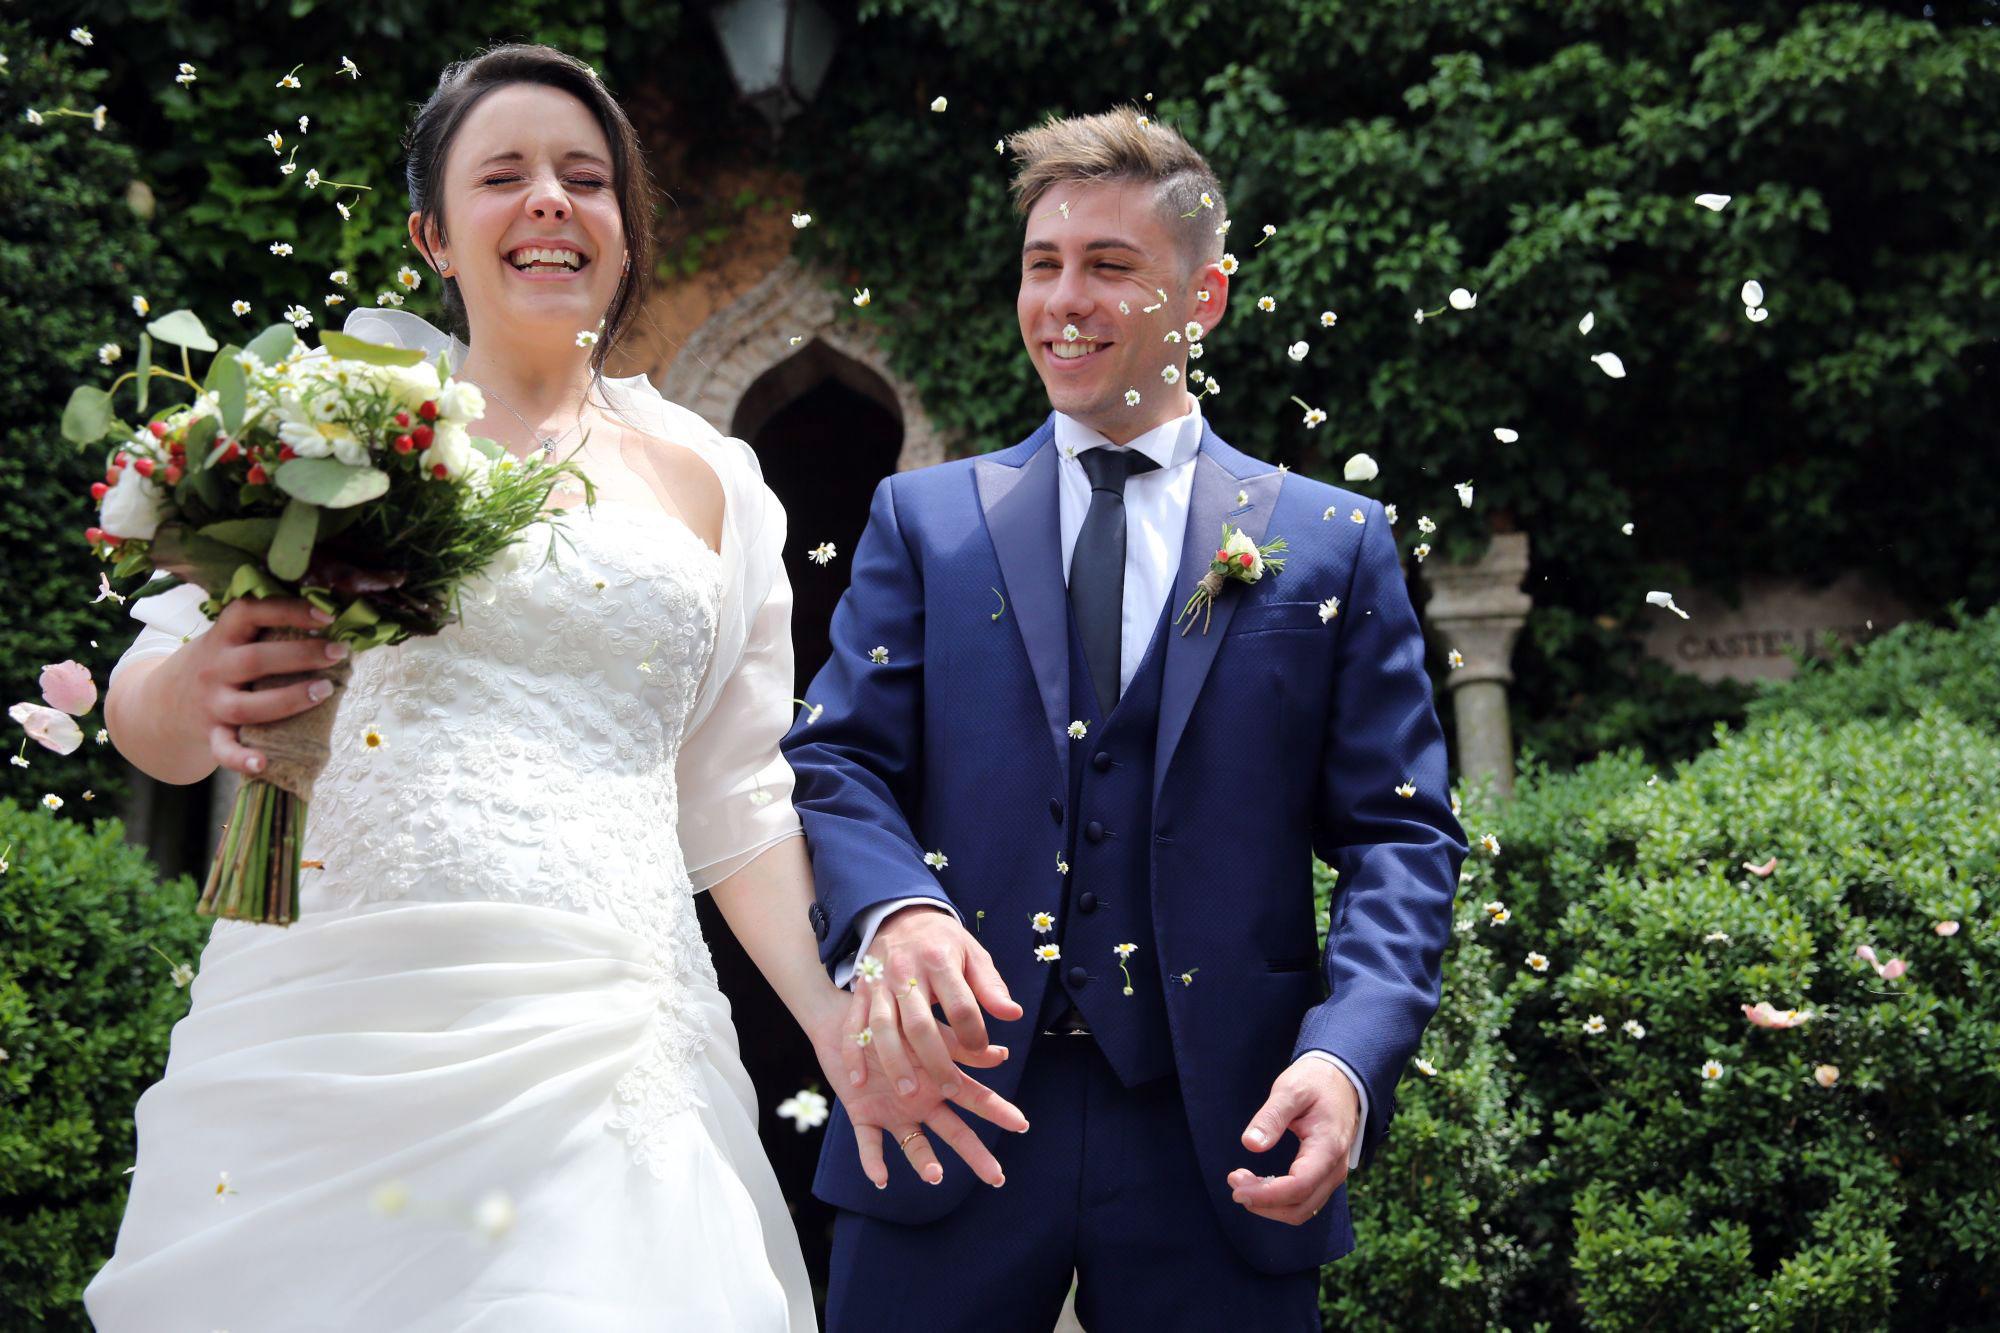 Onice event and wedding planner | Matrimonio Sara e Denis - Parco Sigurtà | Cerimonia di nozze - lancio dei petali